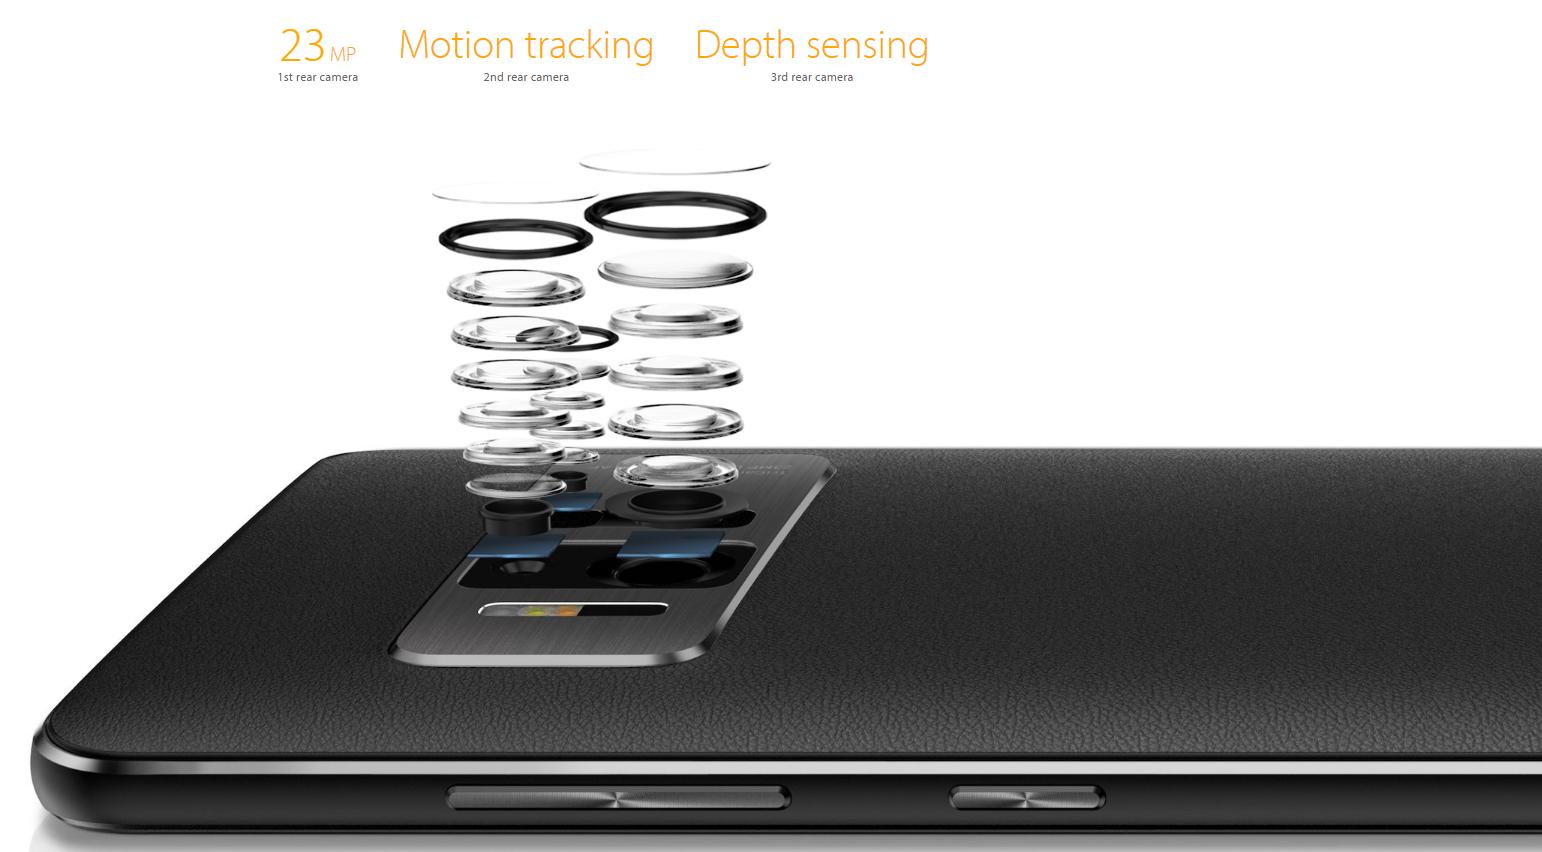 Zenfone VR